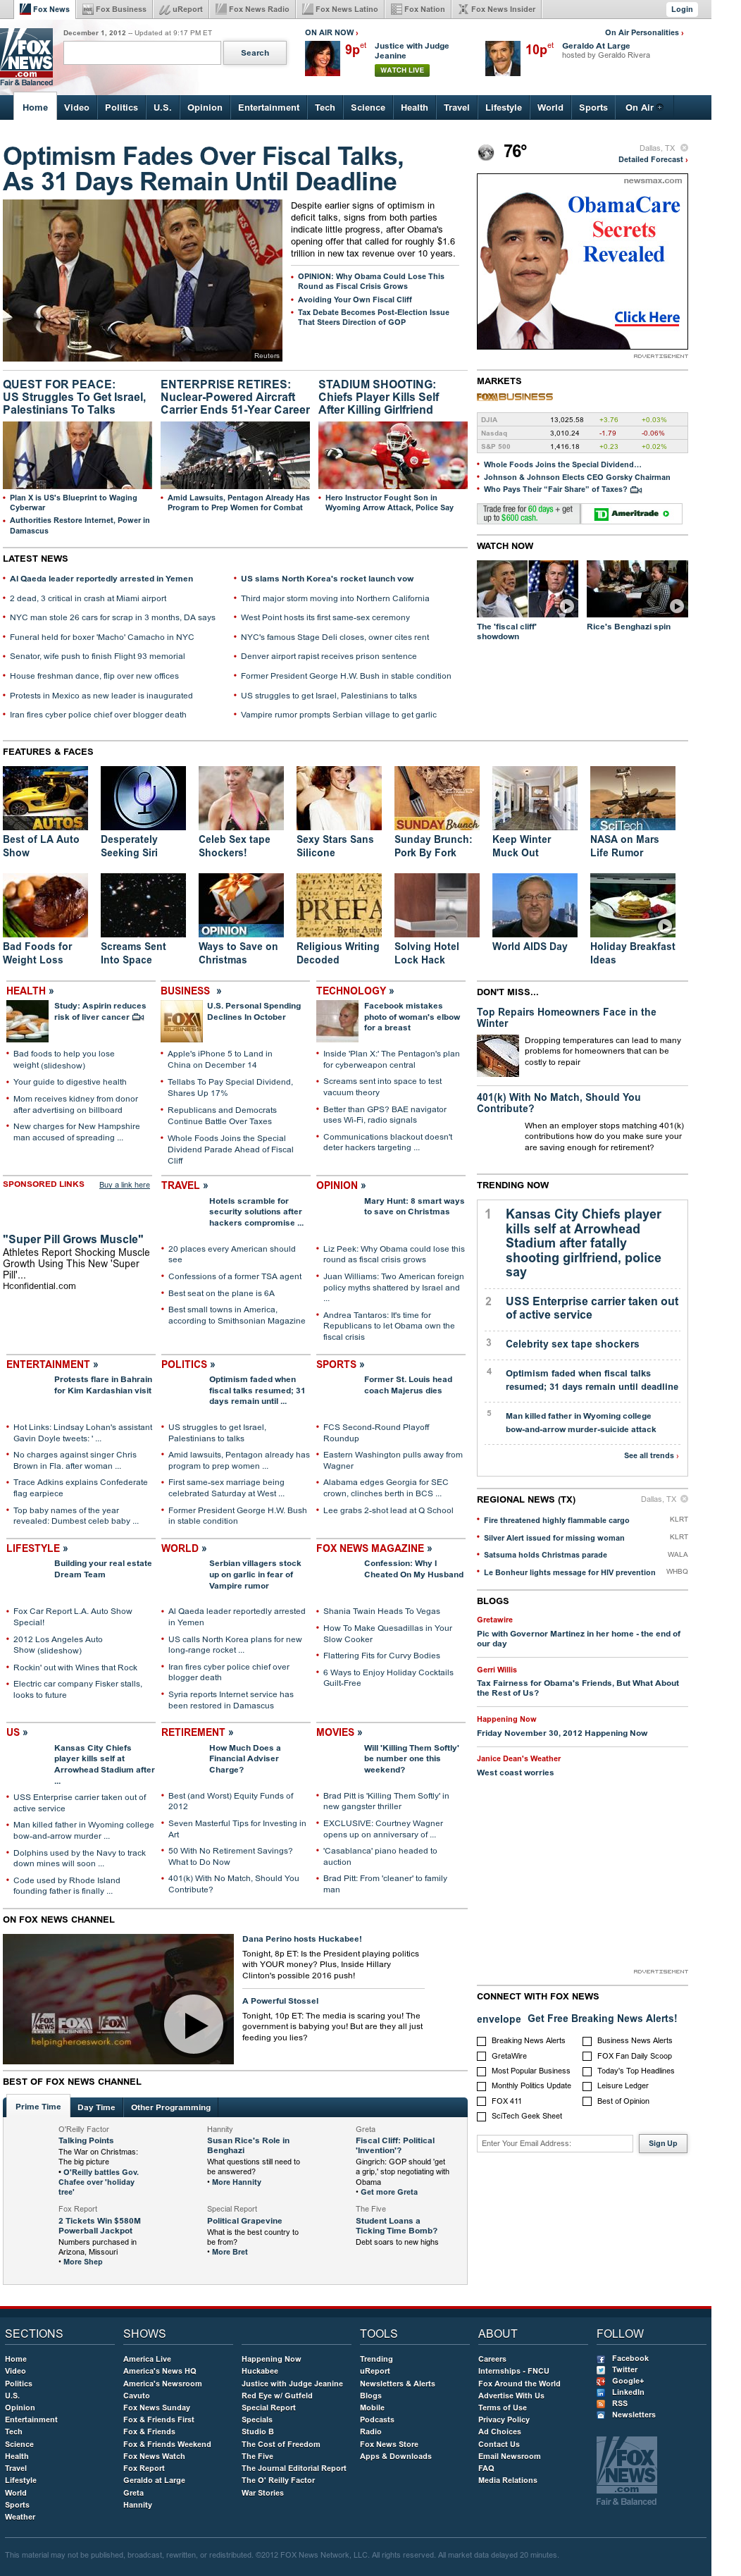 Fox News at Sunday Dec. 2, 2012, 3:09 a.m. UTC